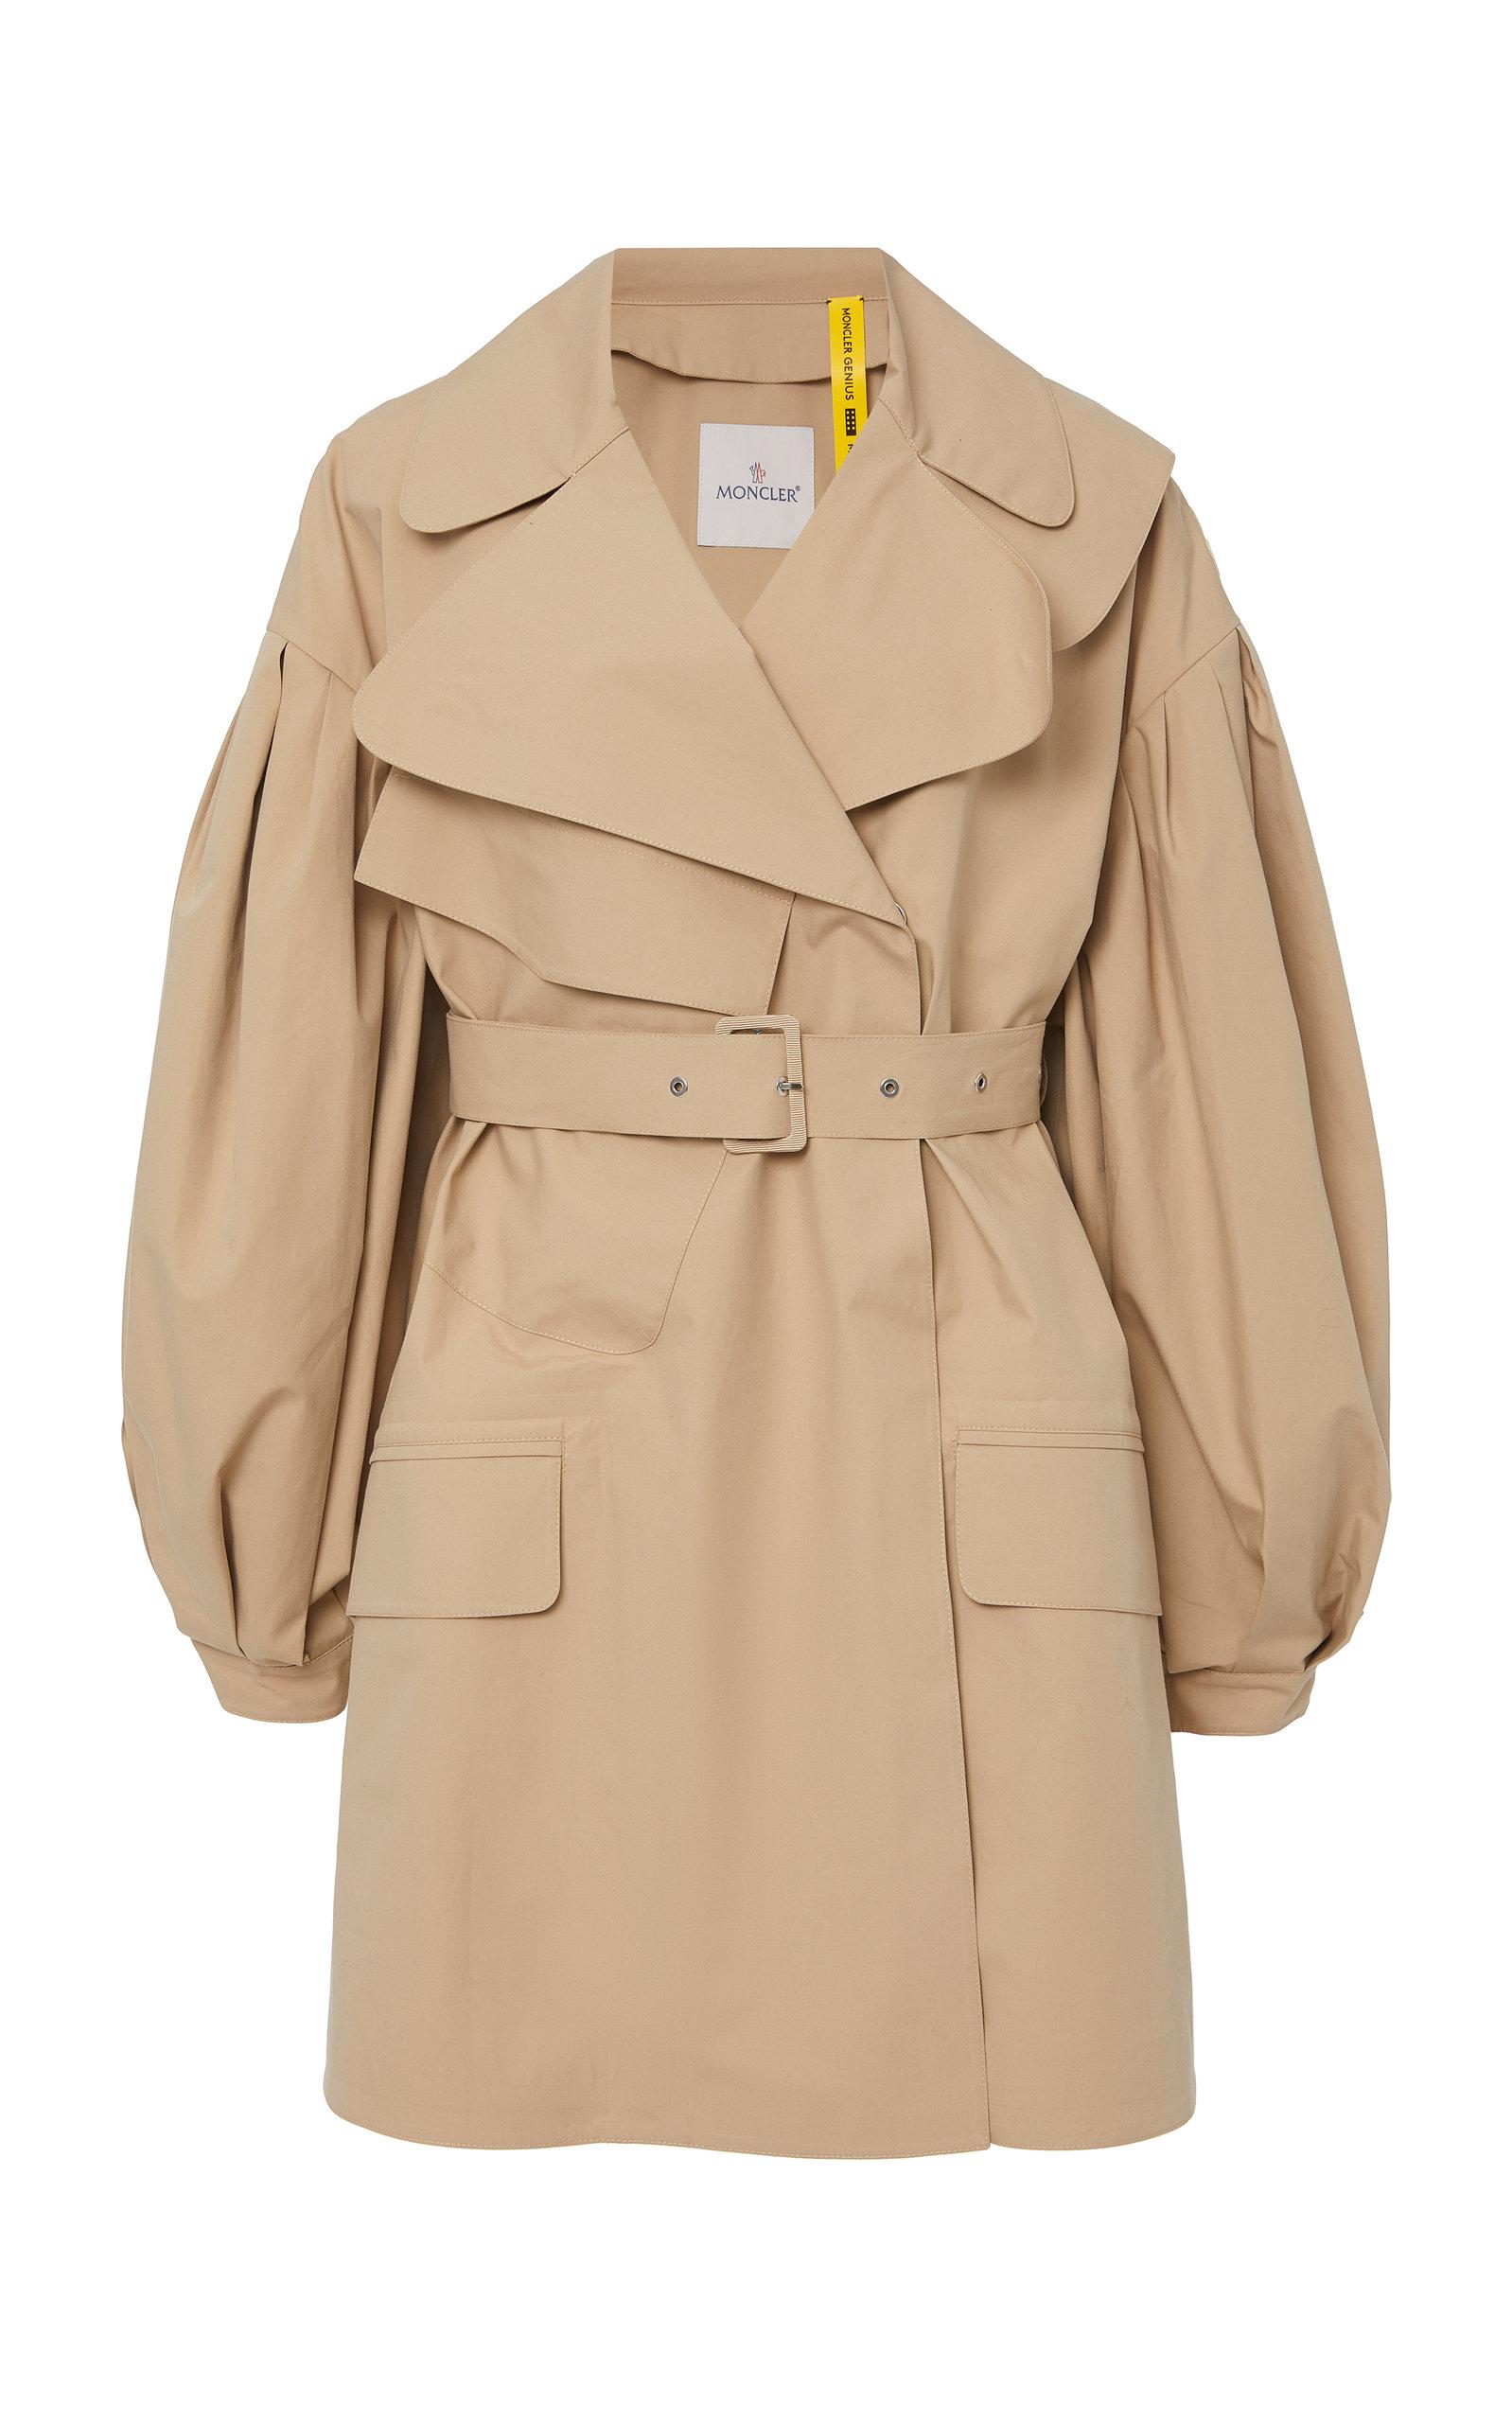 Moncler Genius Coats + SIMONE ROCHA GABARDINE TRENCH COAT